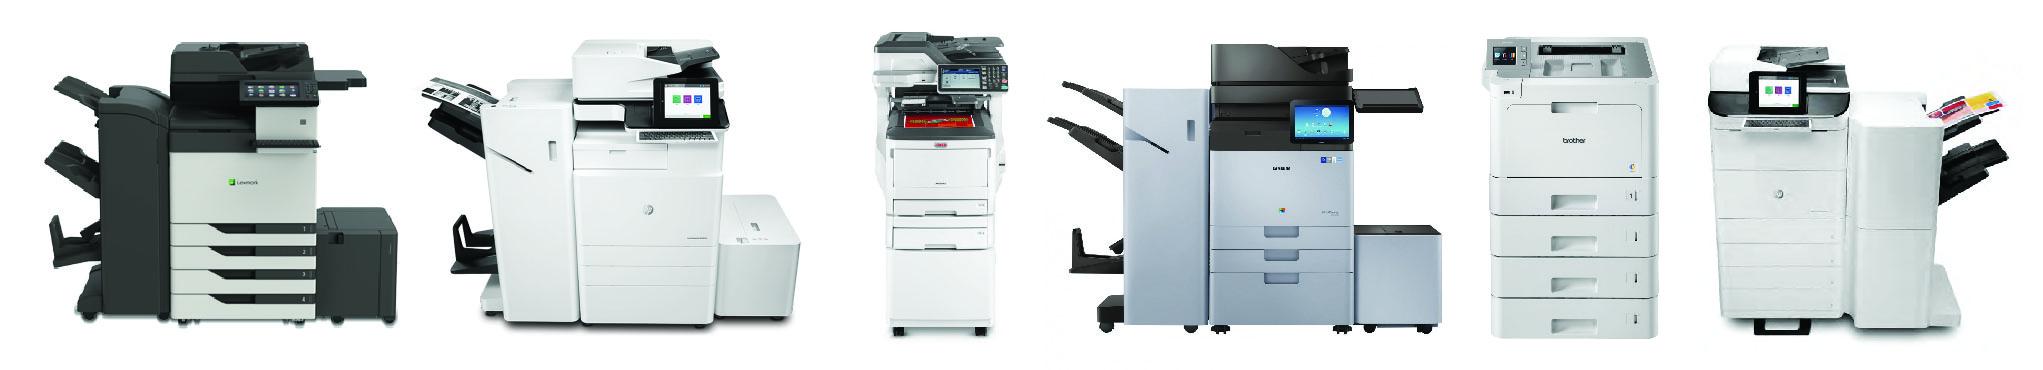 MPS Printers & Copiers